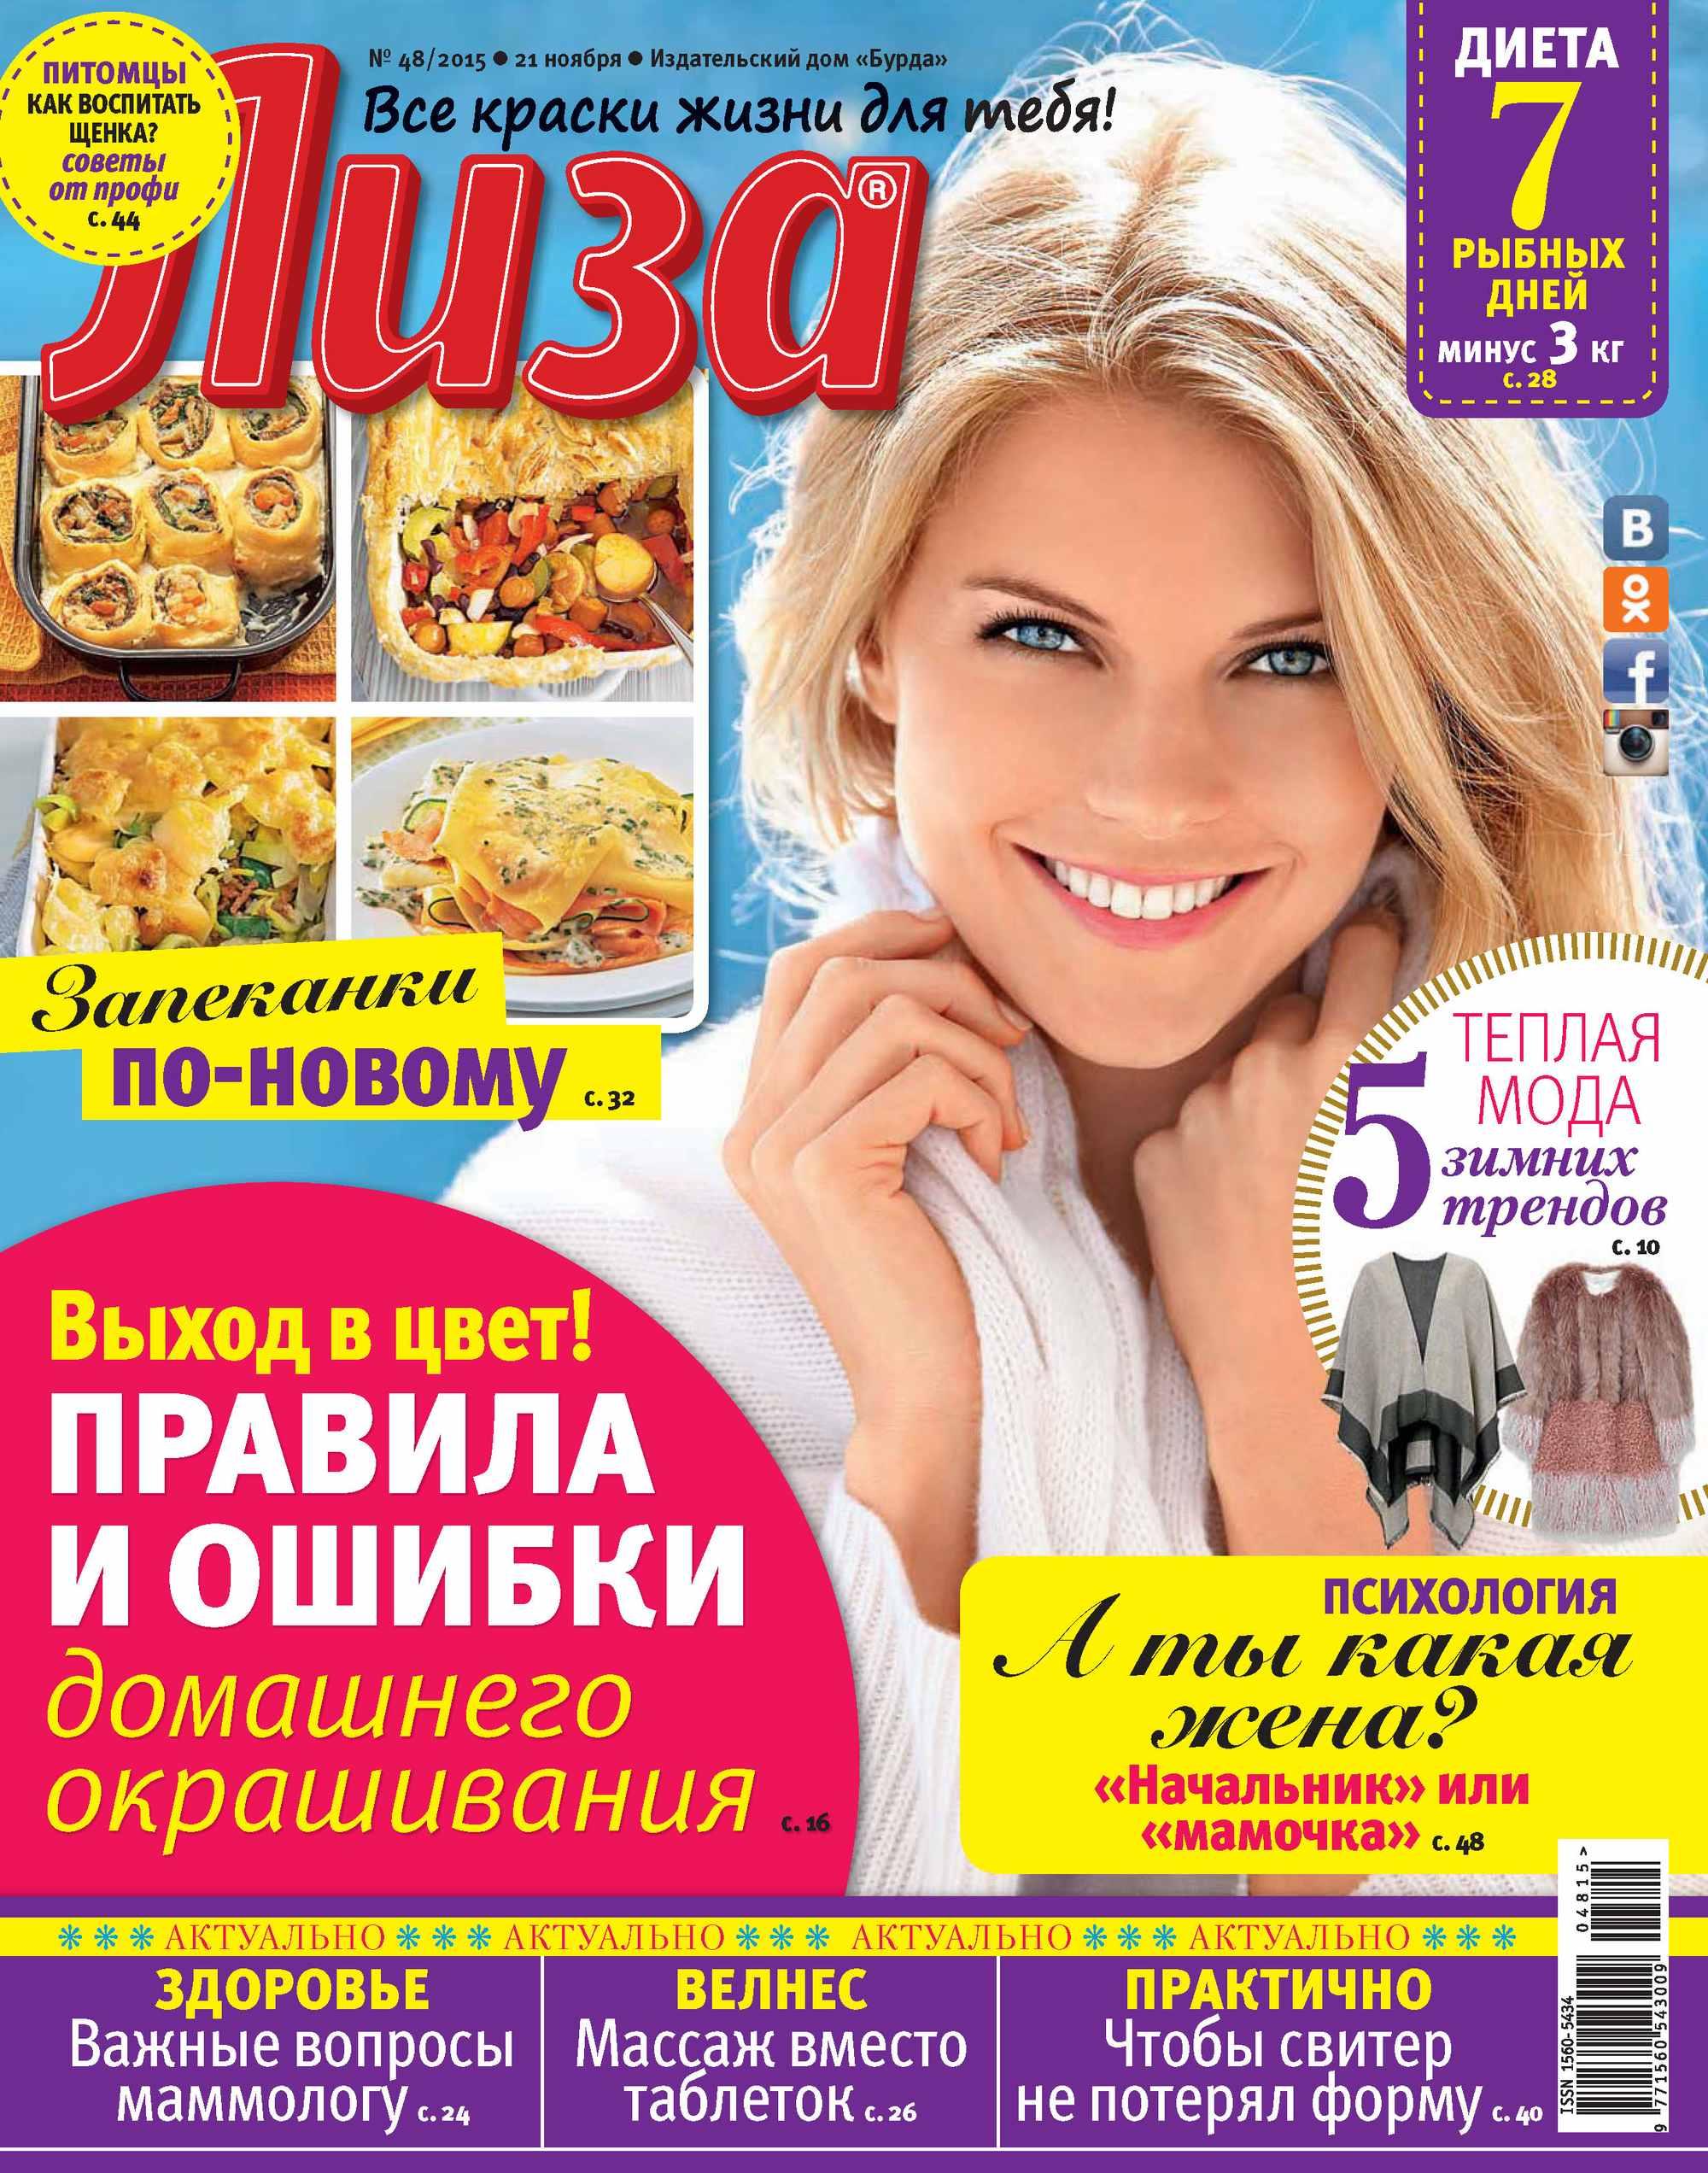 ИД «Бурда» Журнал «Лиза» №48/2015 ид бурда журнал лиза 34 2015